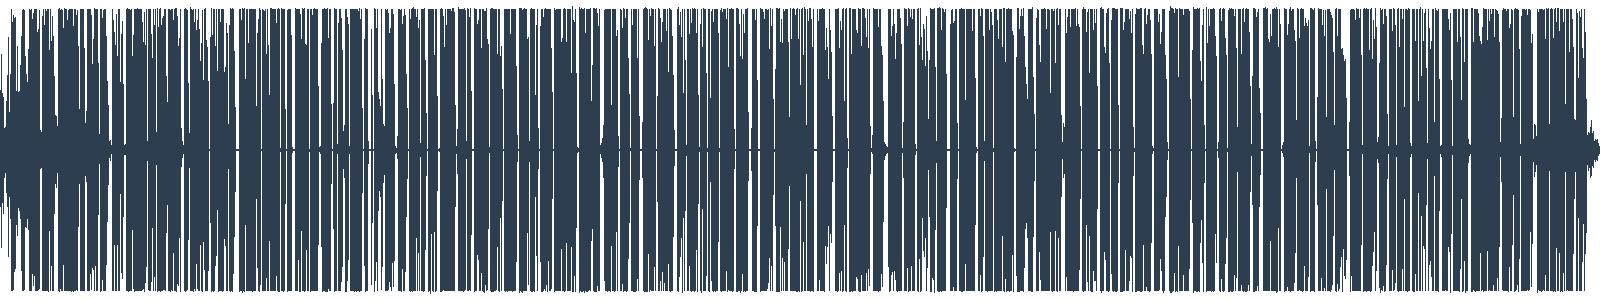 #1 Ľudová slovesnosť (Maturita s Hashtagom) waveform